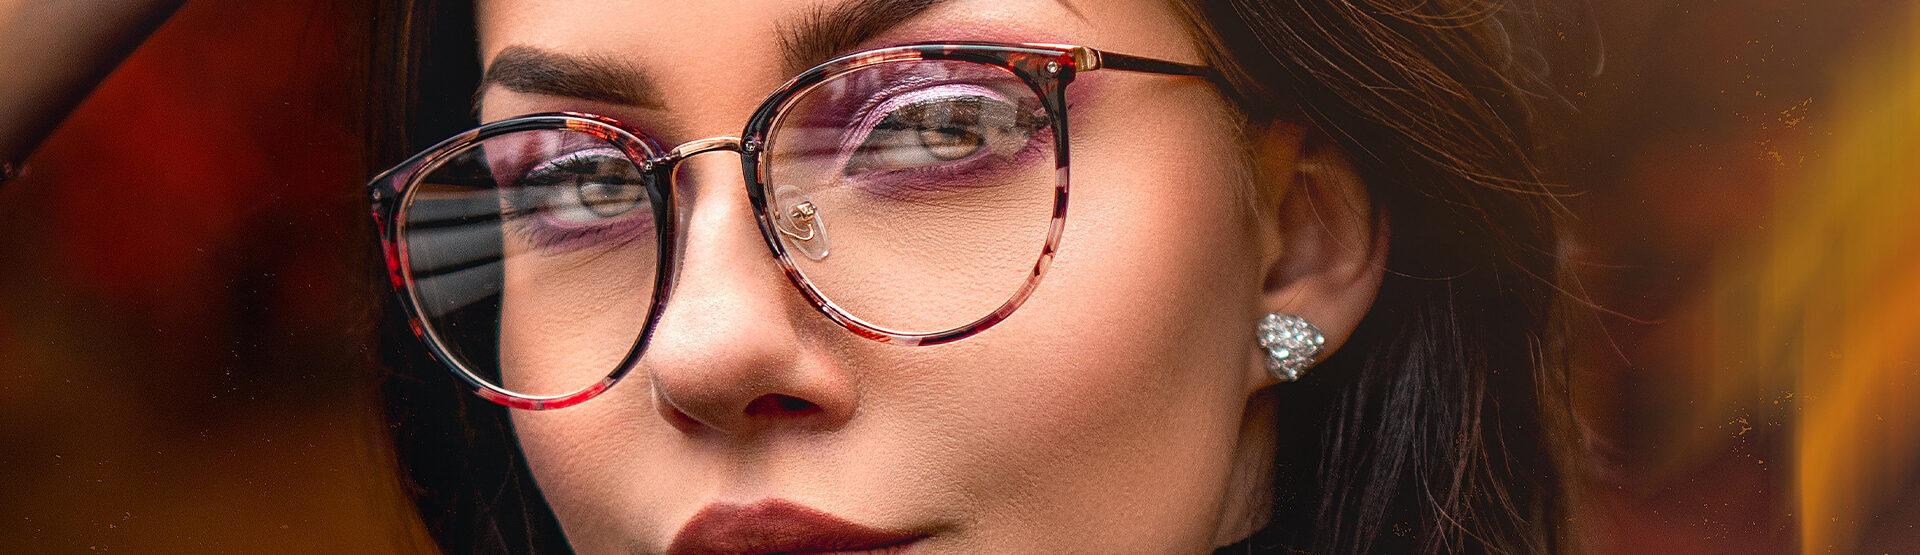 makeup occhiali